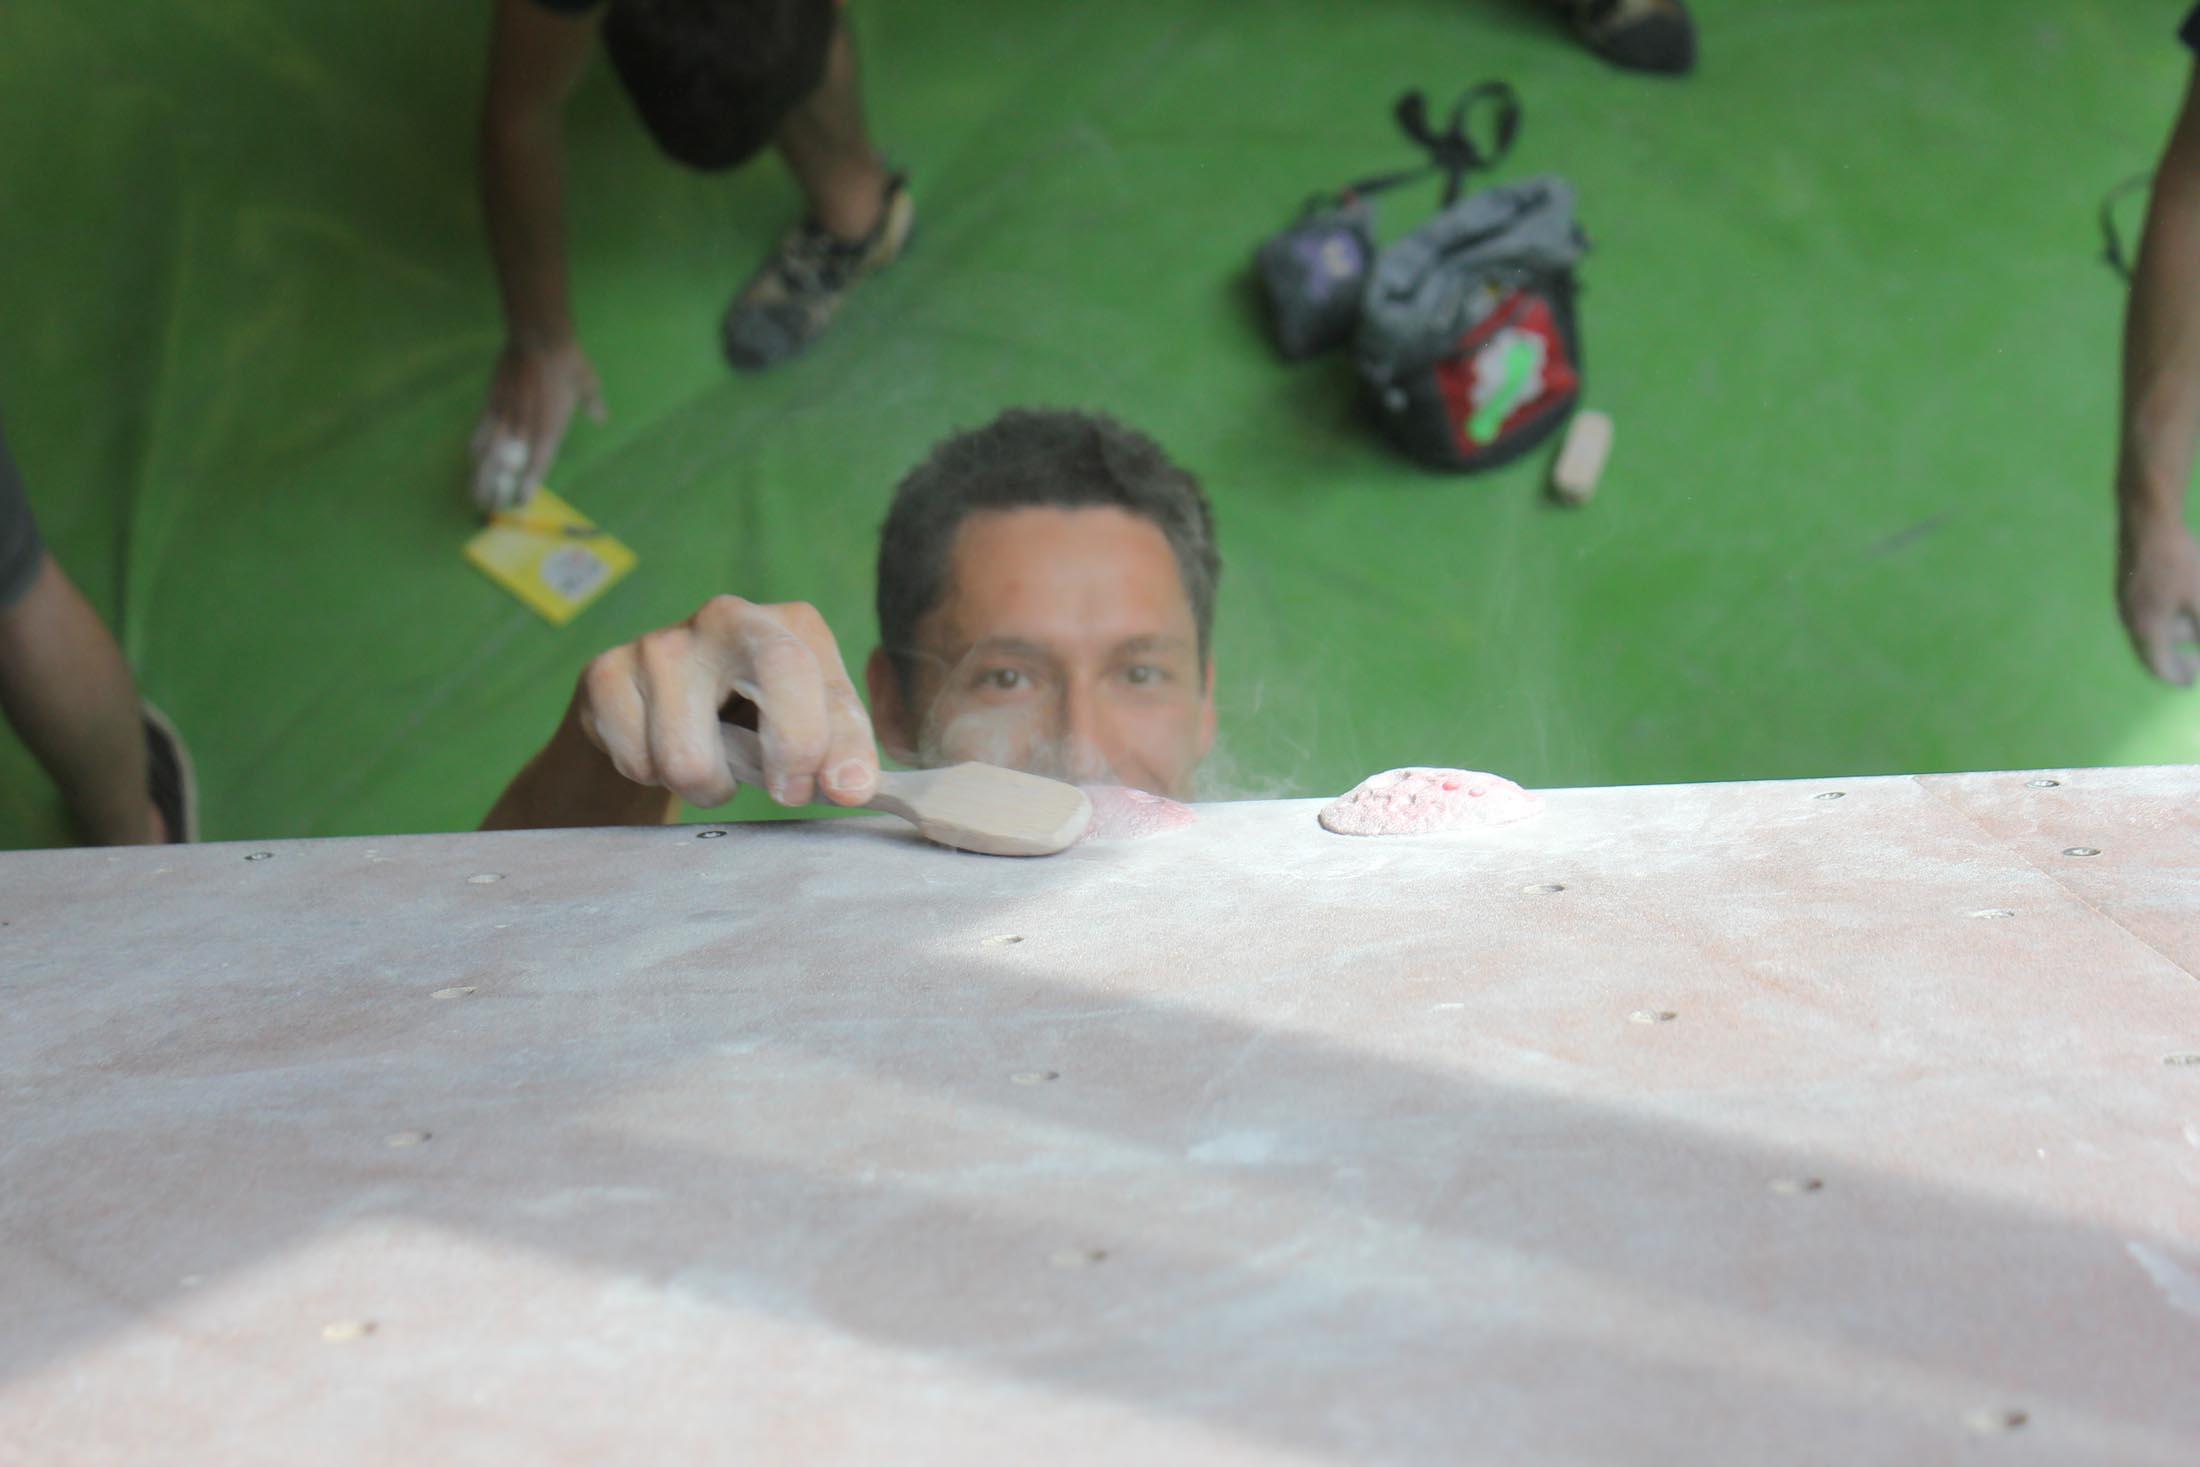 Quali, internationaler bouldercup Frankenjura 2016, BLOCKHELDEN Erlangen, Mammut, Bergfreunde.de, Boulderwettkampf07092016311